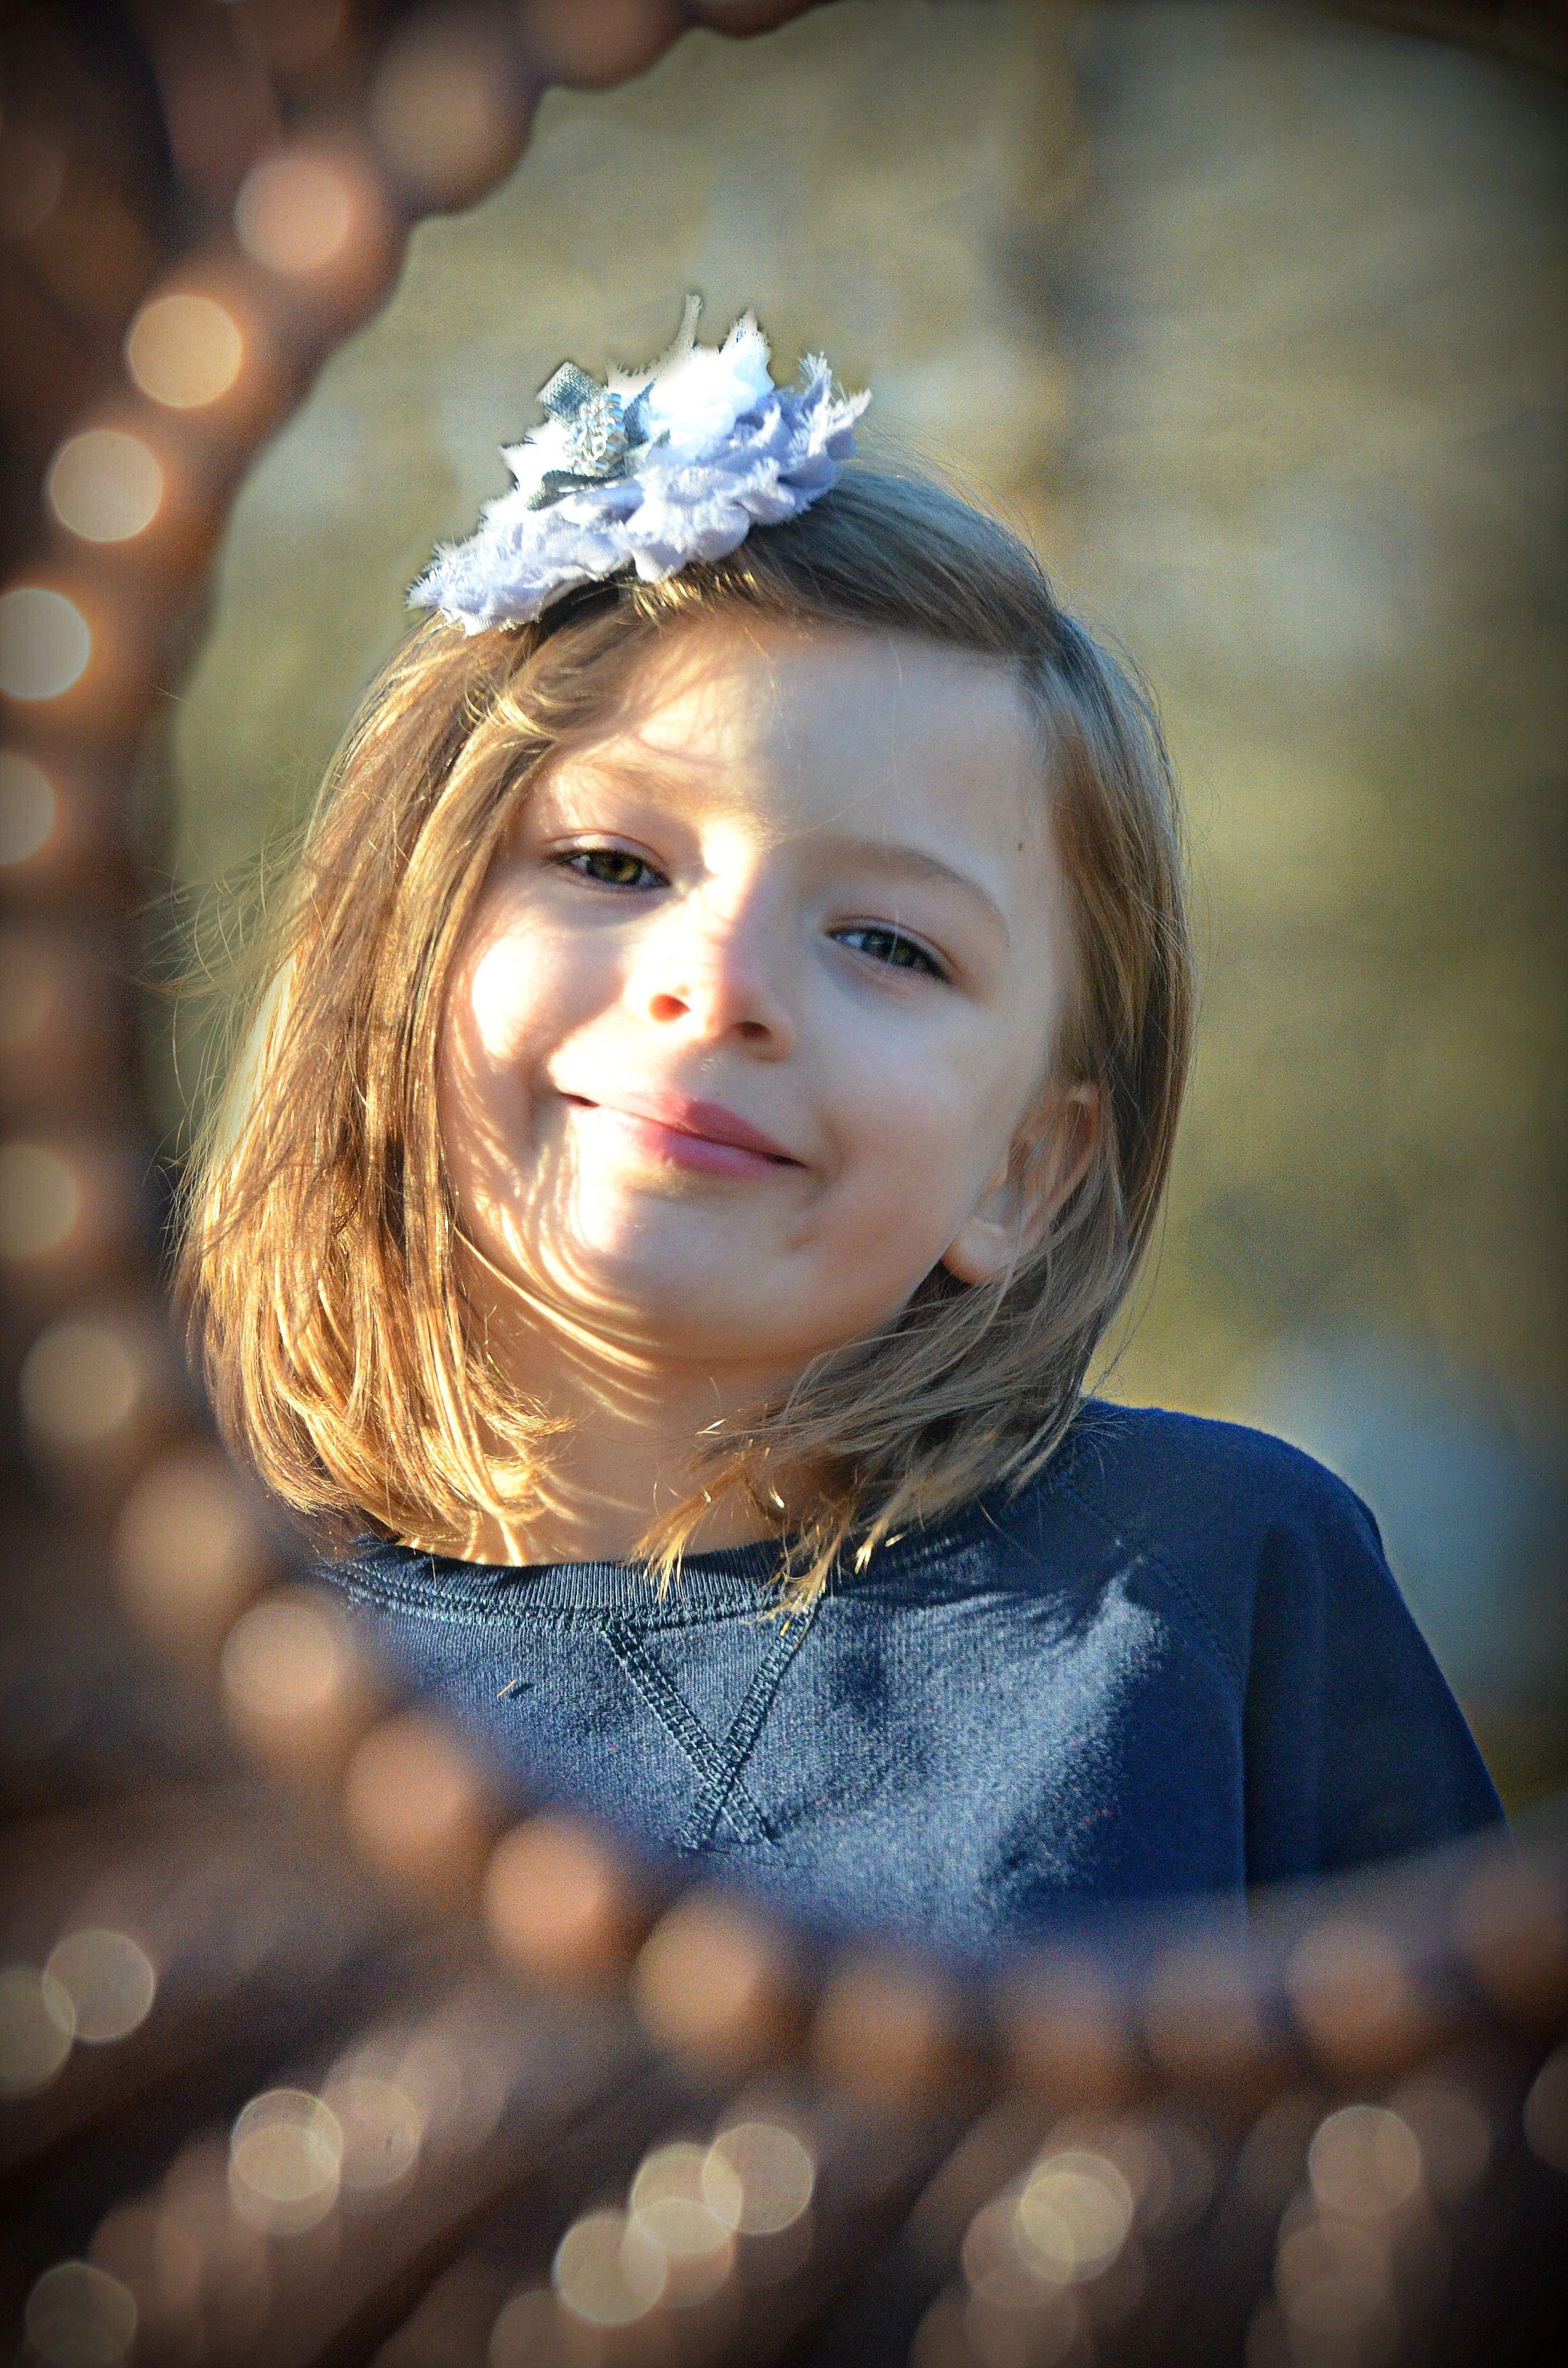 Creative Child Pose Reflective Pose Creates A Very